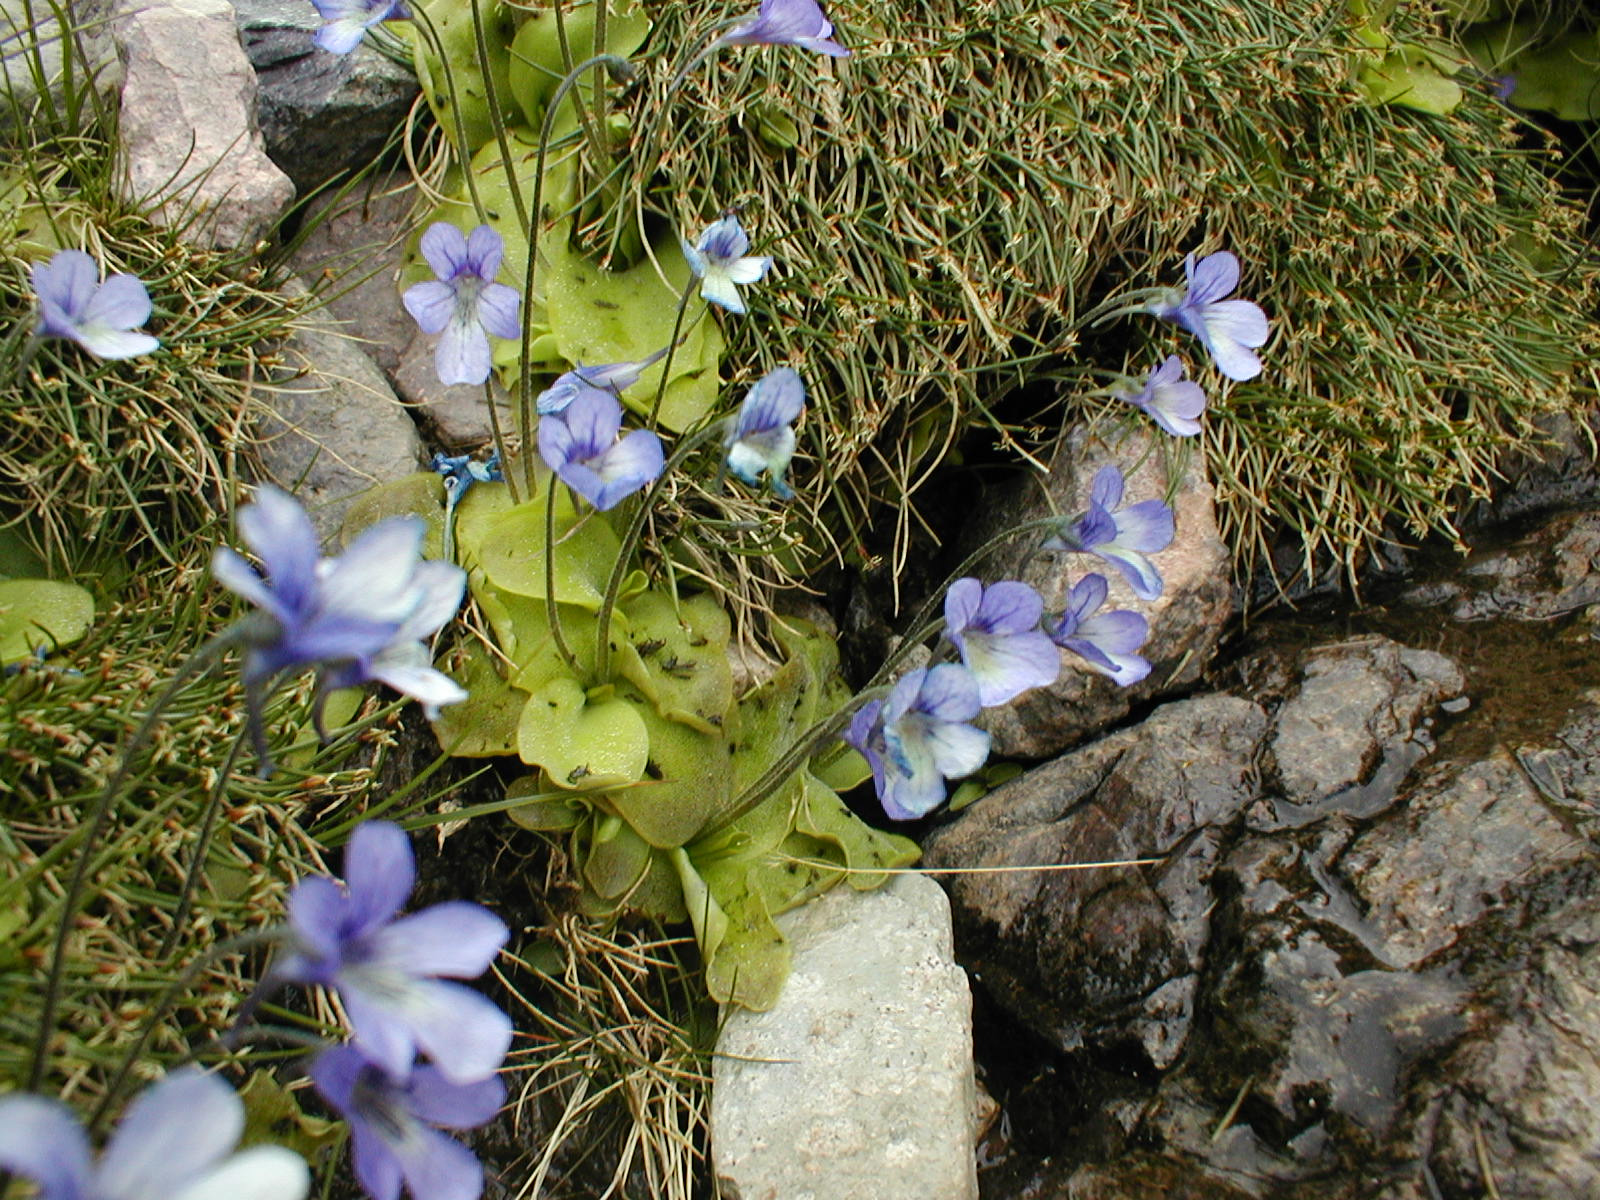 Pinguicula moranensis Ayautla Rare Mexican Carnivorous Plants